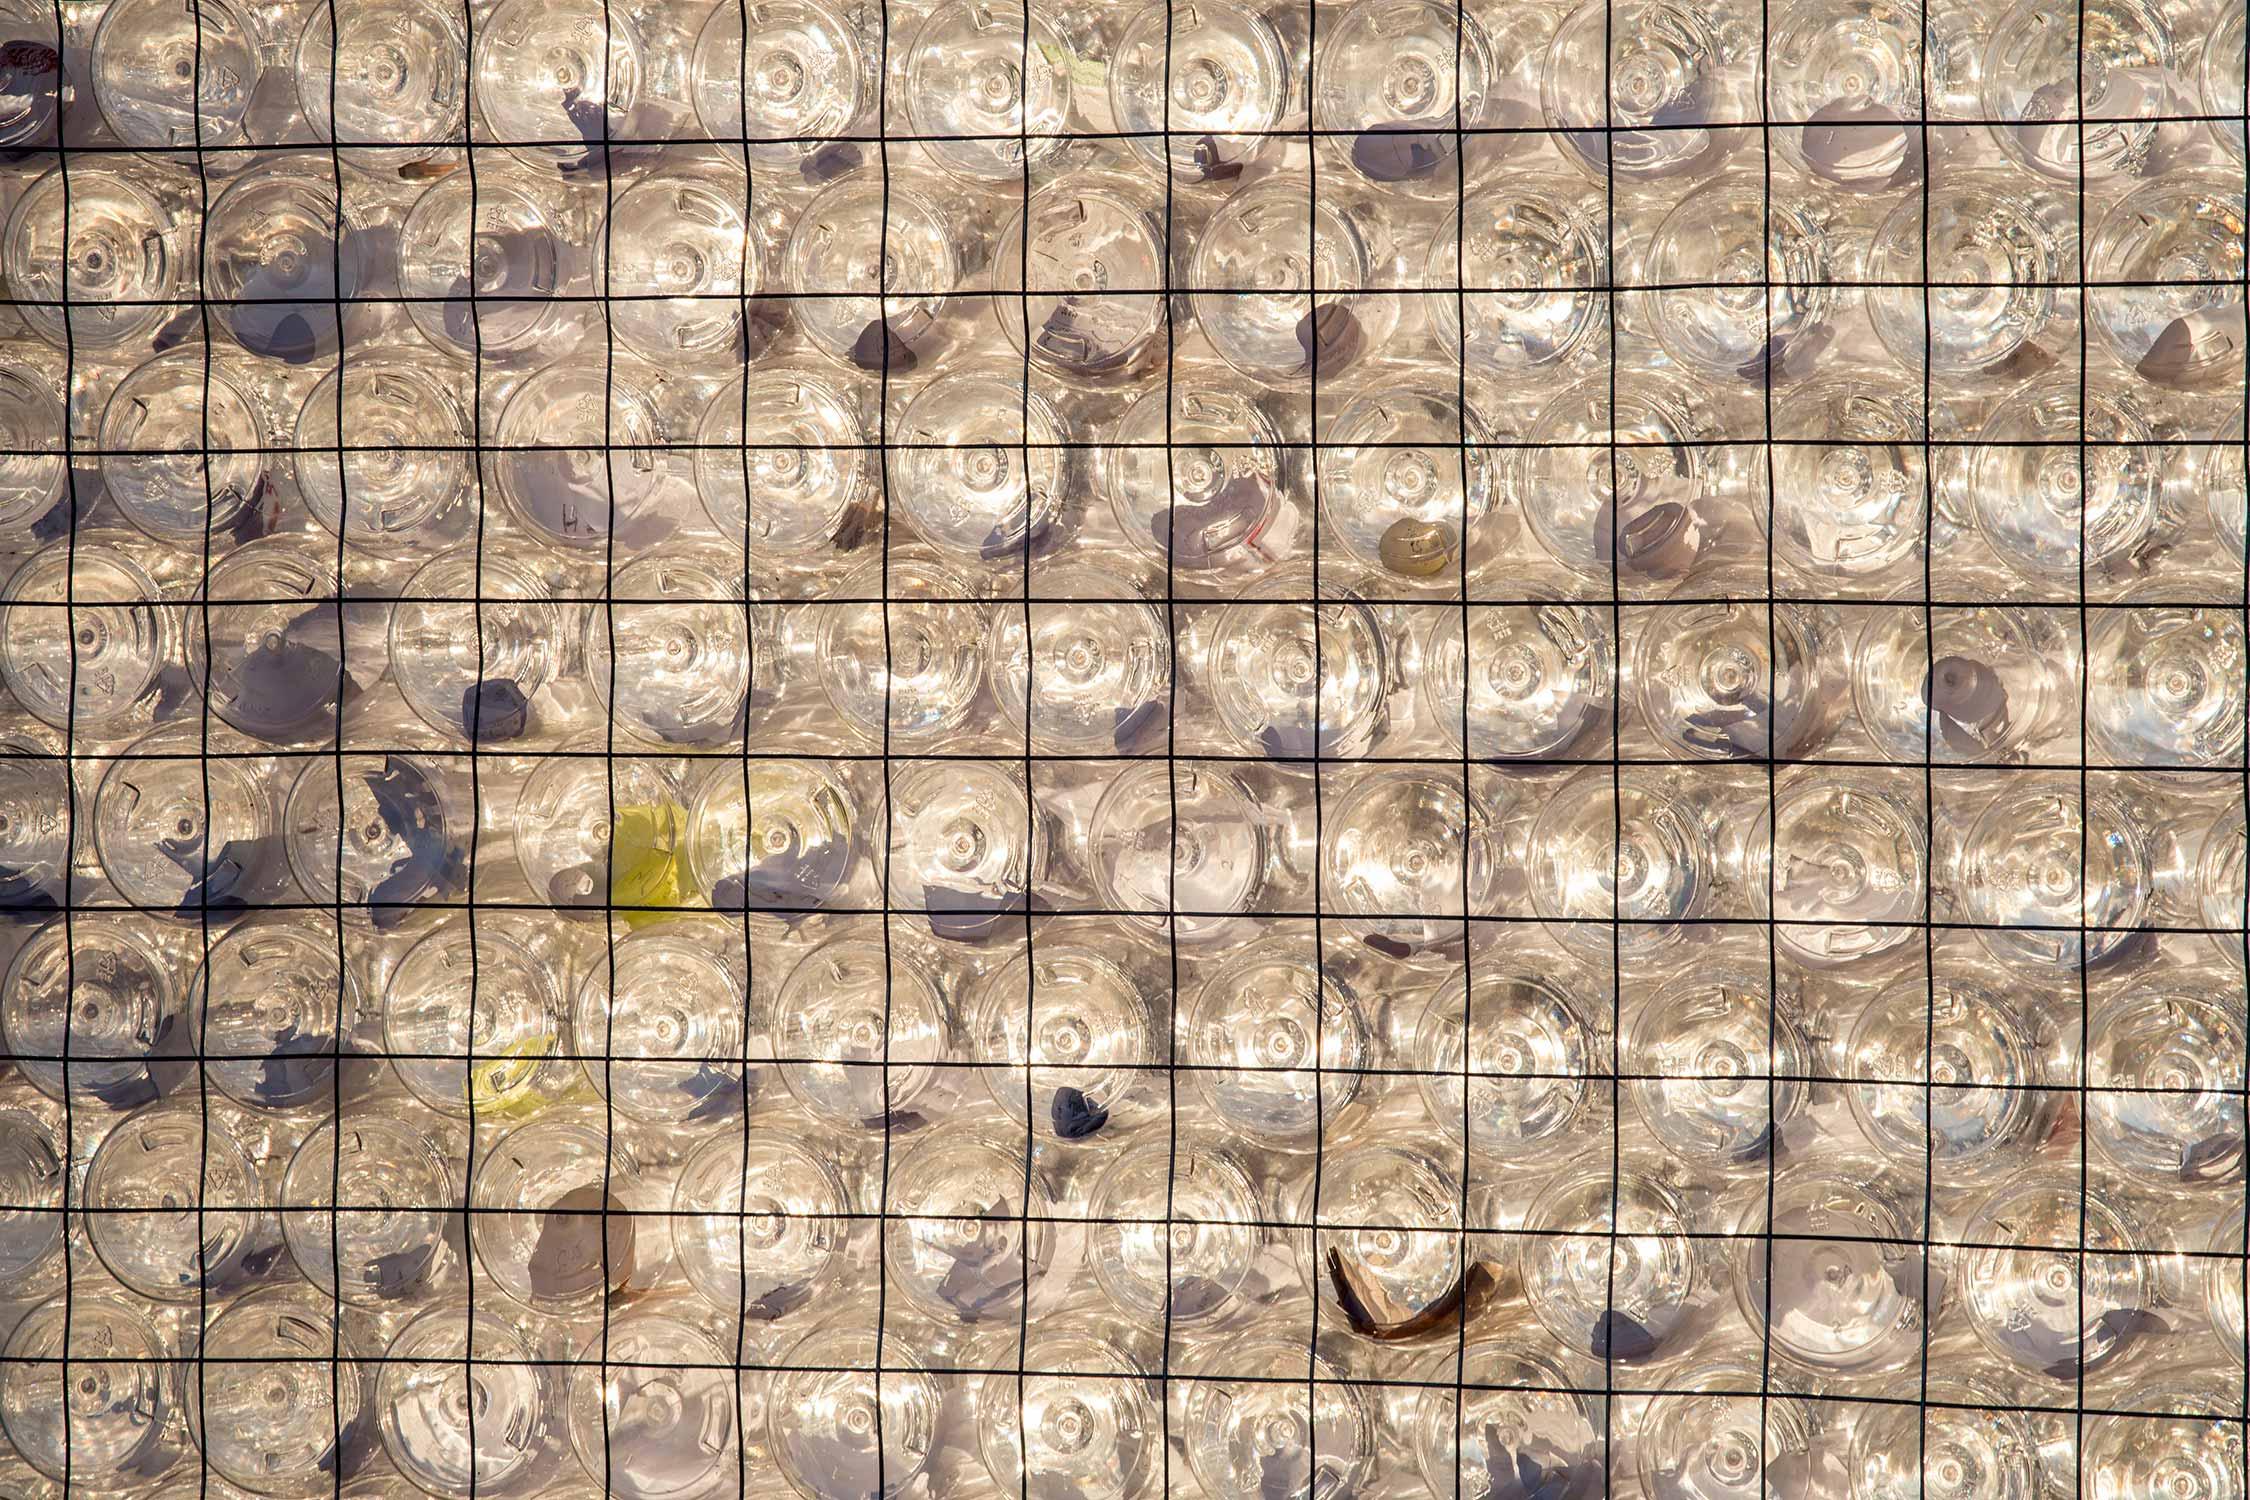 Collective Memory, Mario García, Barcelona, Spain & Andrea, Govi, Milan, Italy